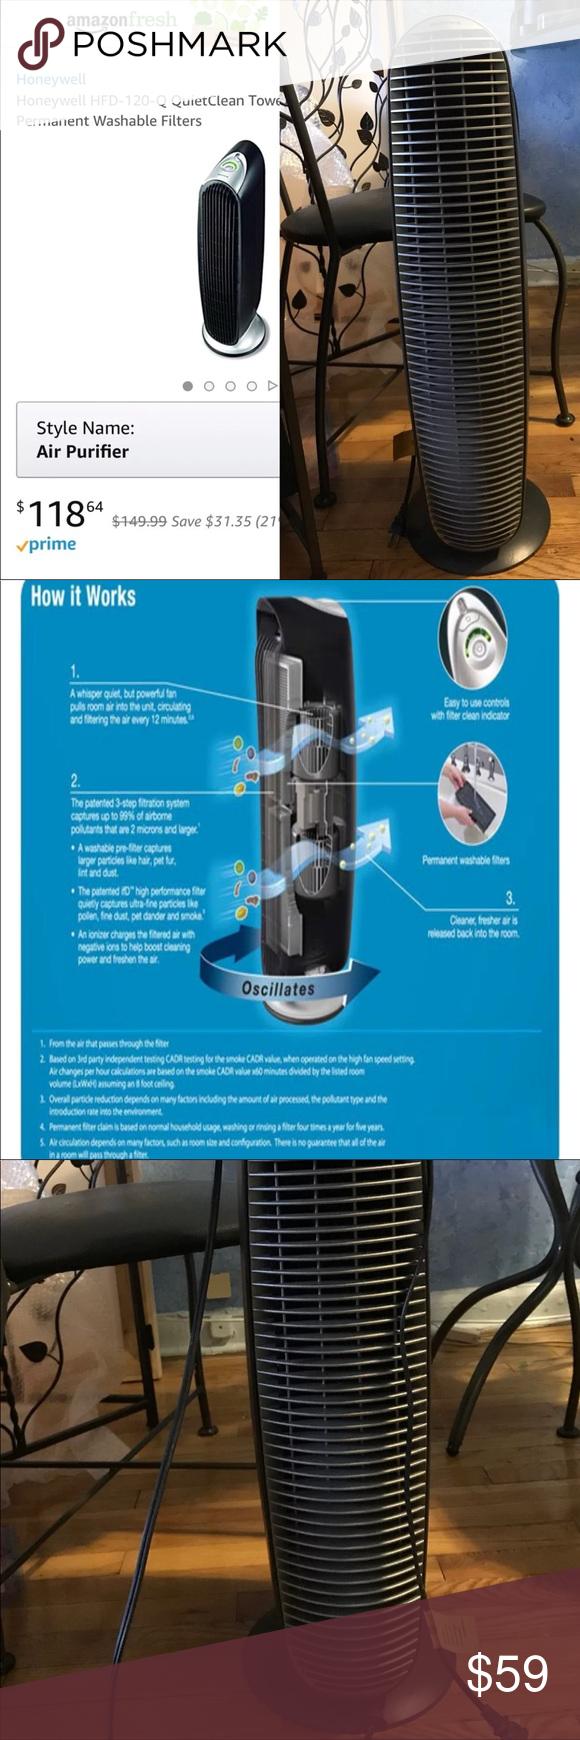 Honeywell Portable Air Purifier, Permanent Filter Portable